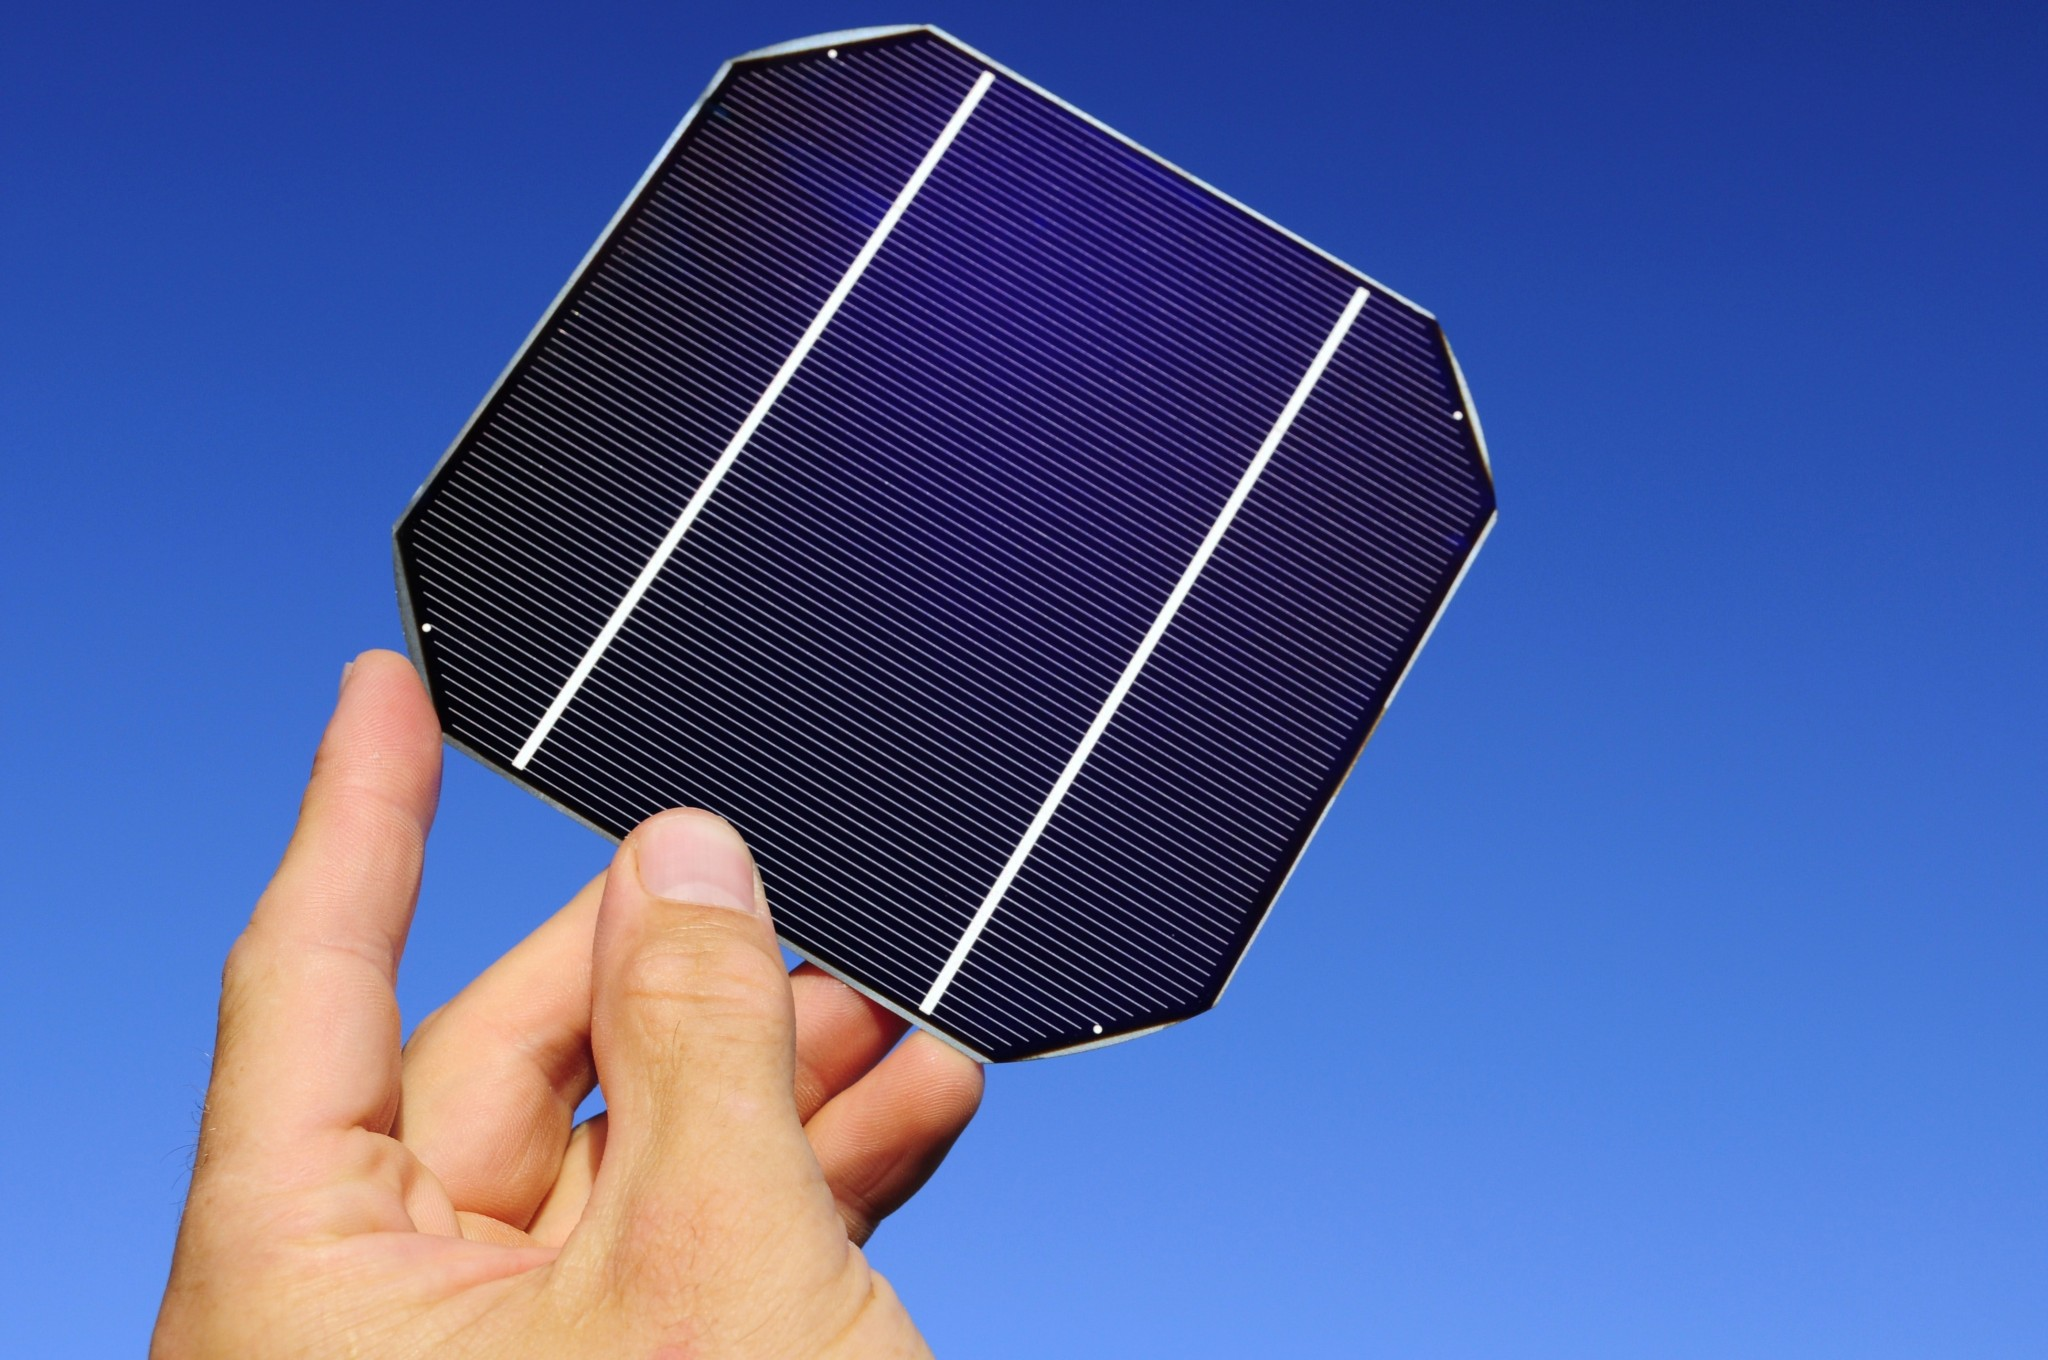 energia solar impactos ambientais _ célula fotovoltaica